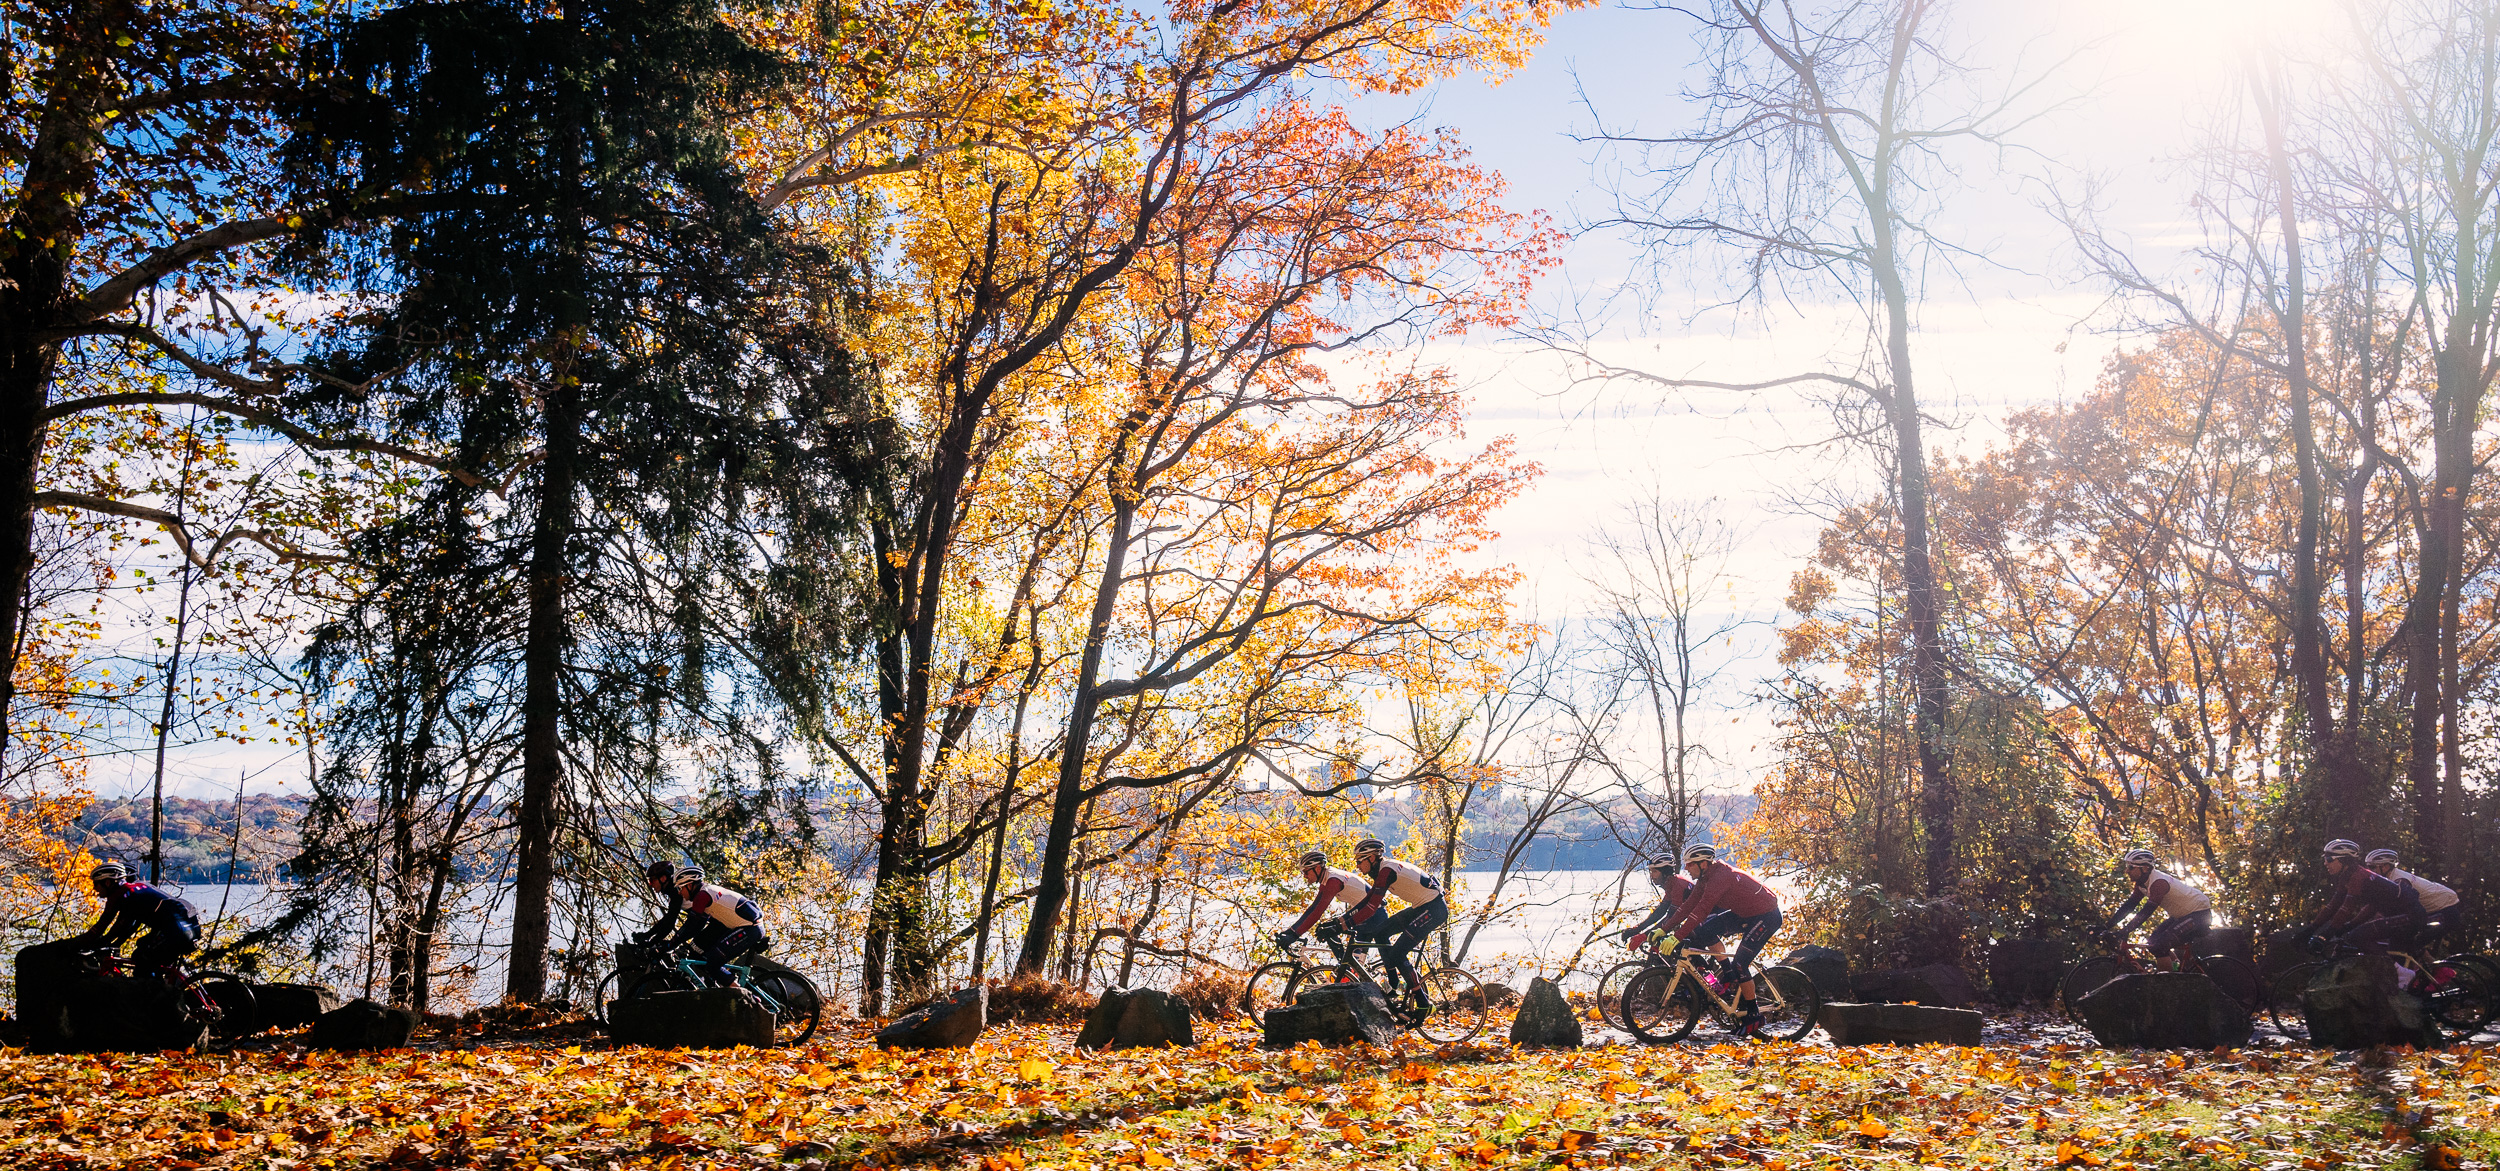 photo-rhetoric-to-be-determined-river-road-fall-foliage-5032.jpg